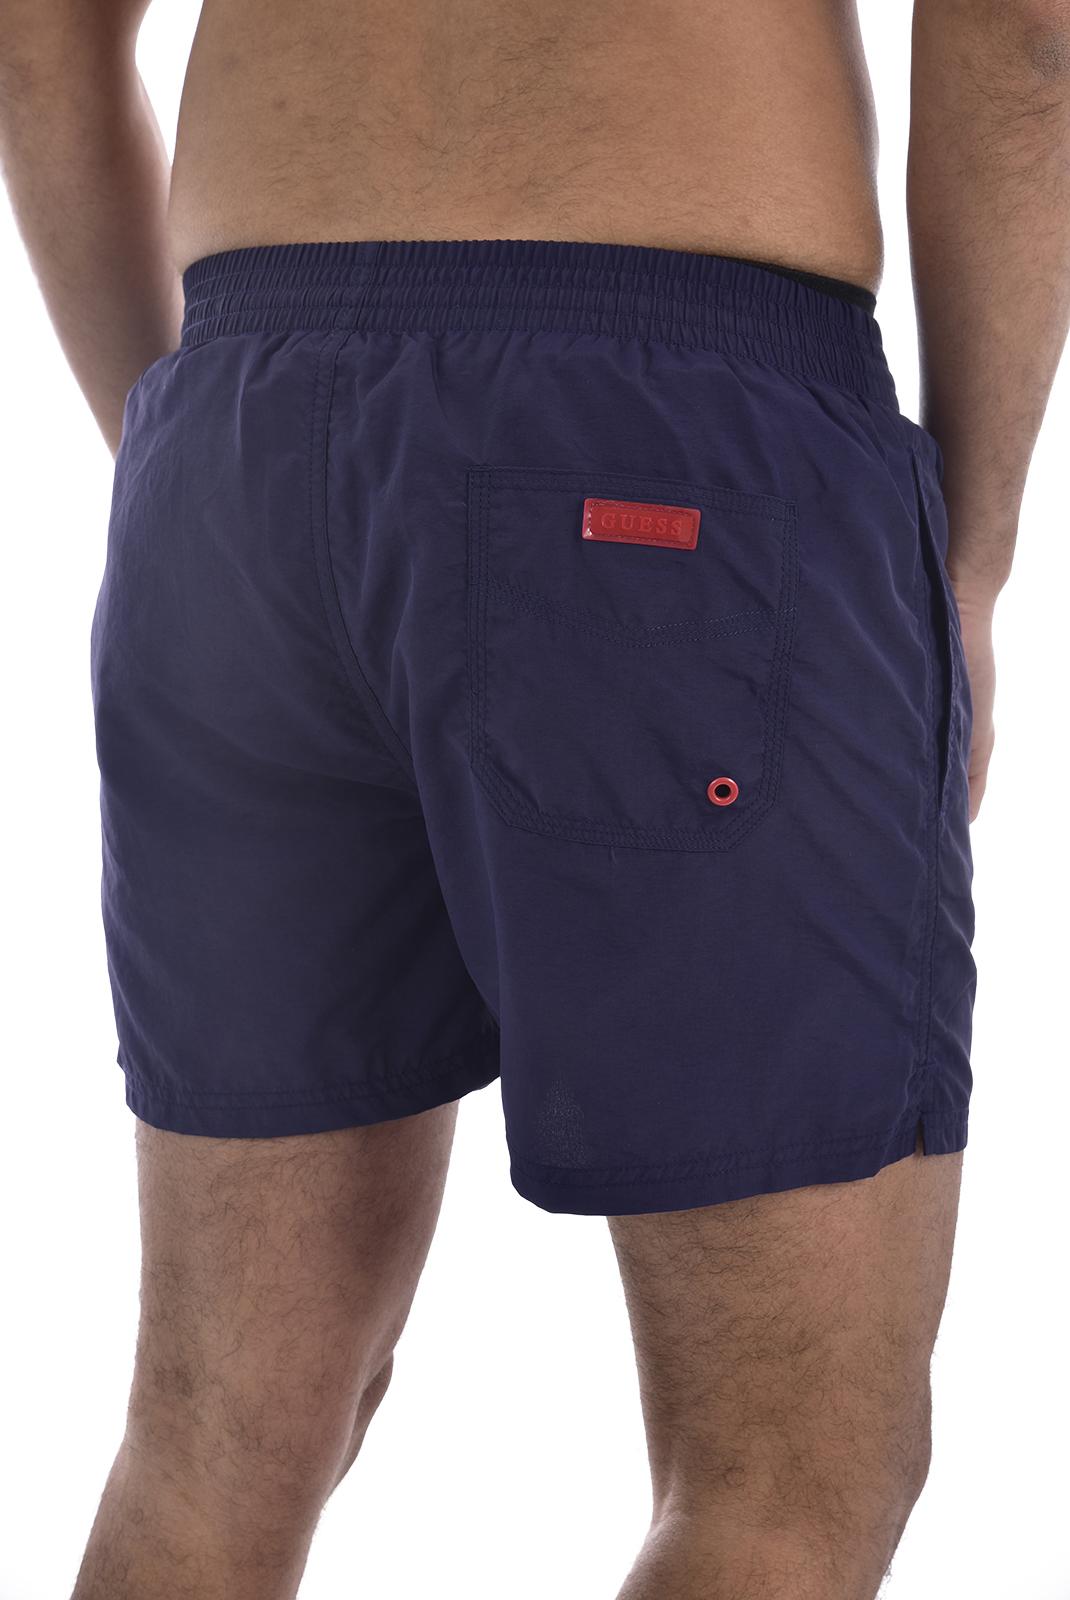 Shorts de bain  Guess jeans F02T00 TEL27 NAVY